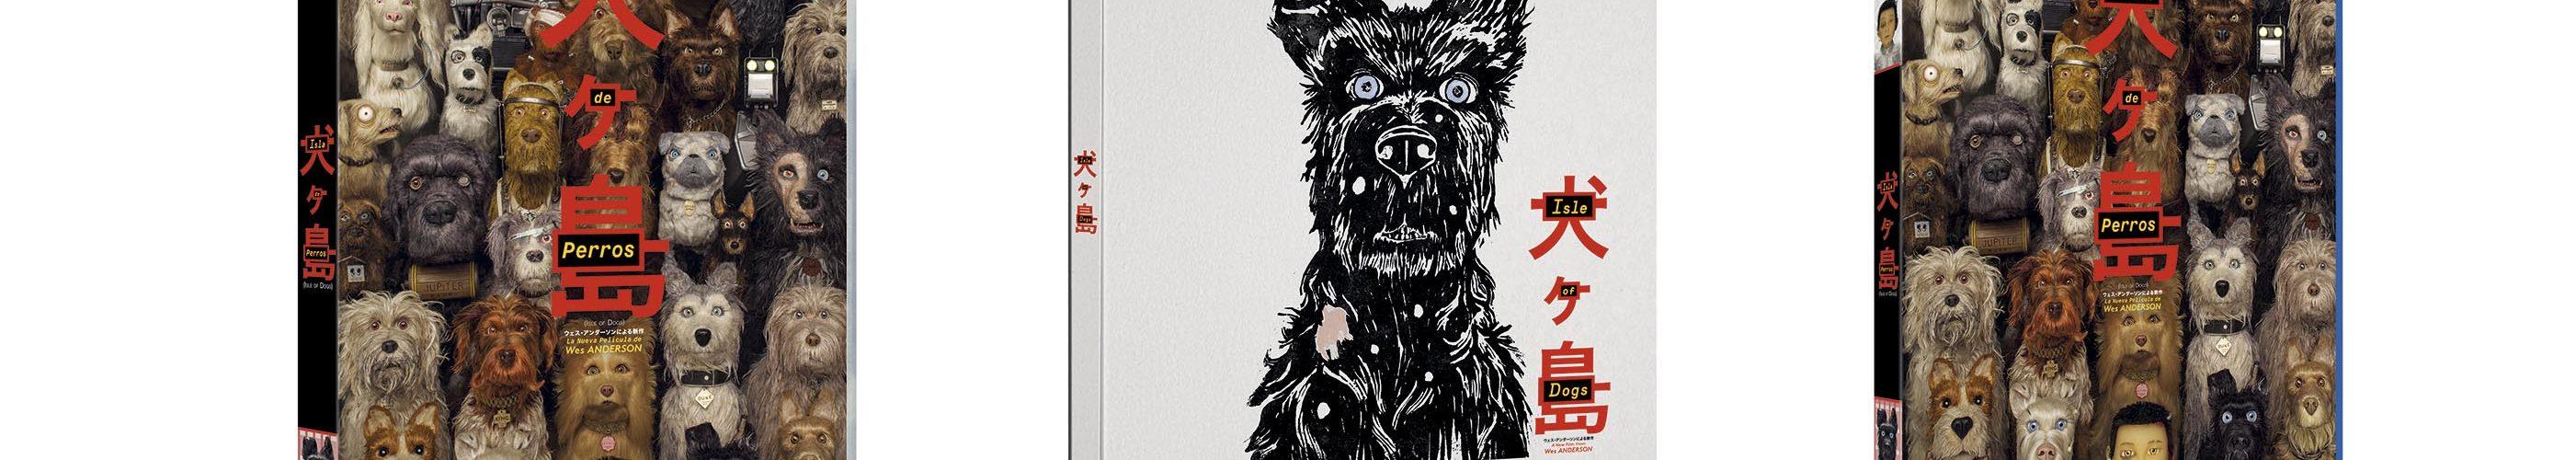 Isla perros dvd